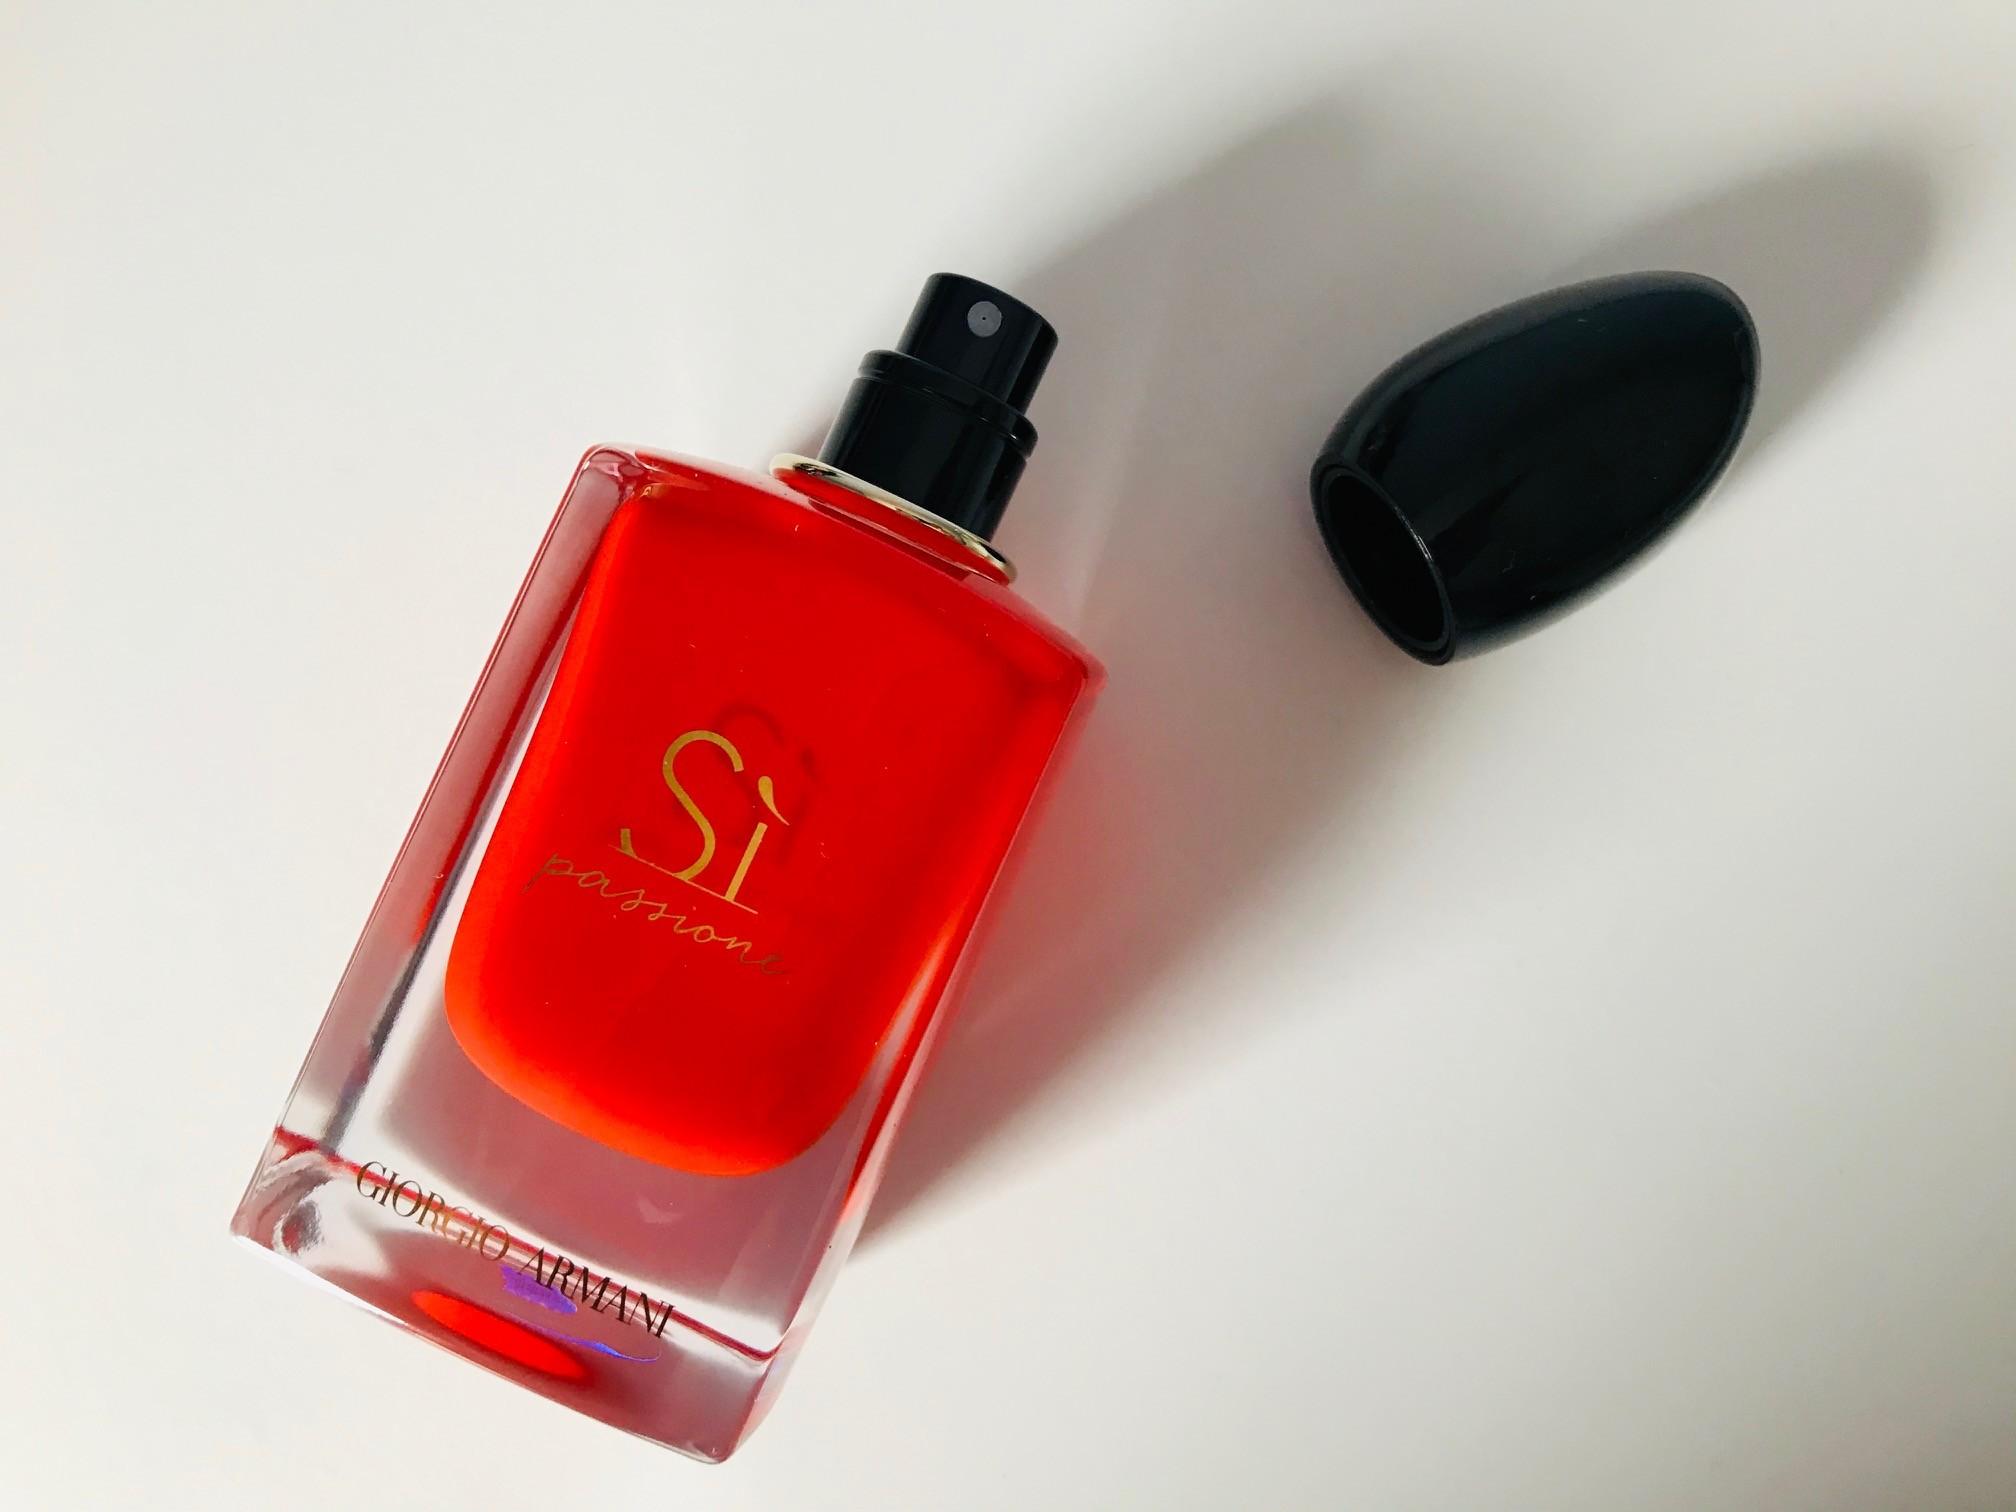 armani si passione intense parfum